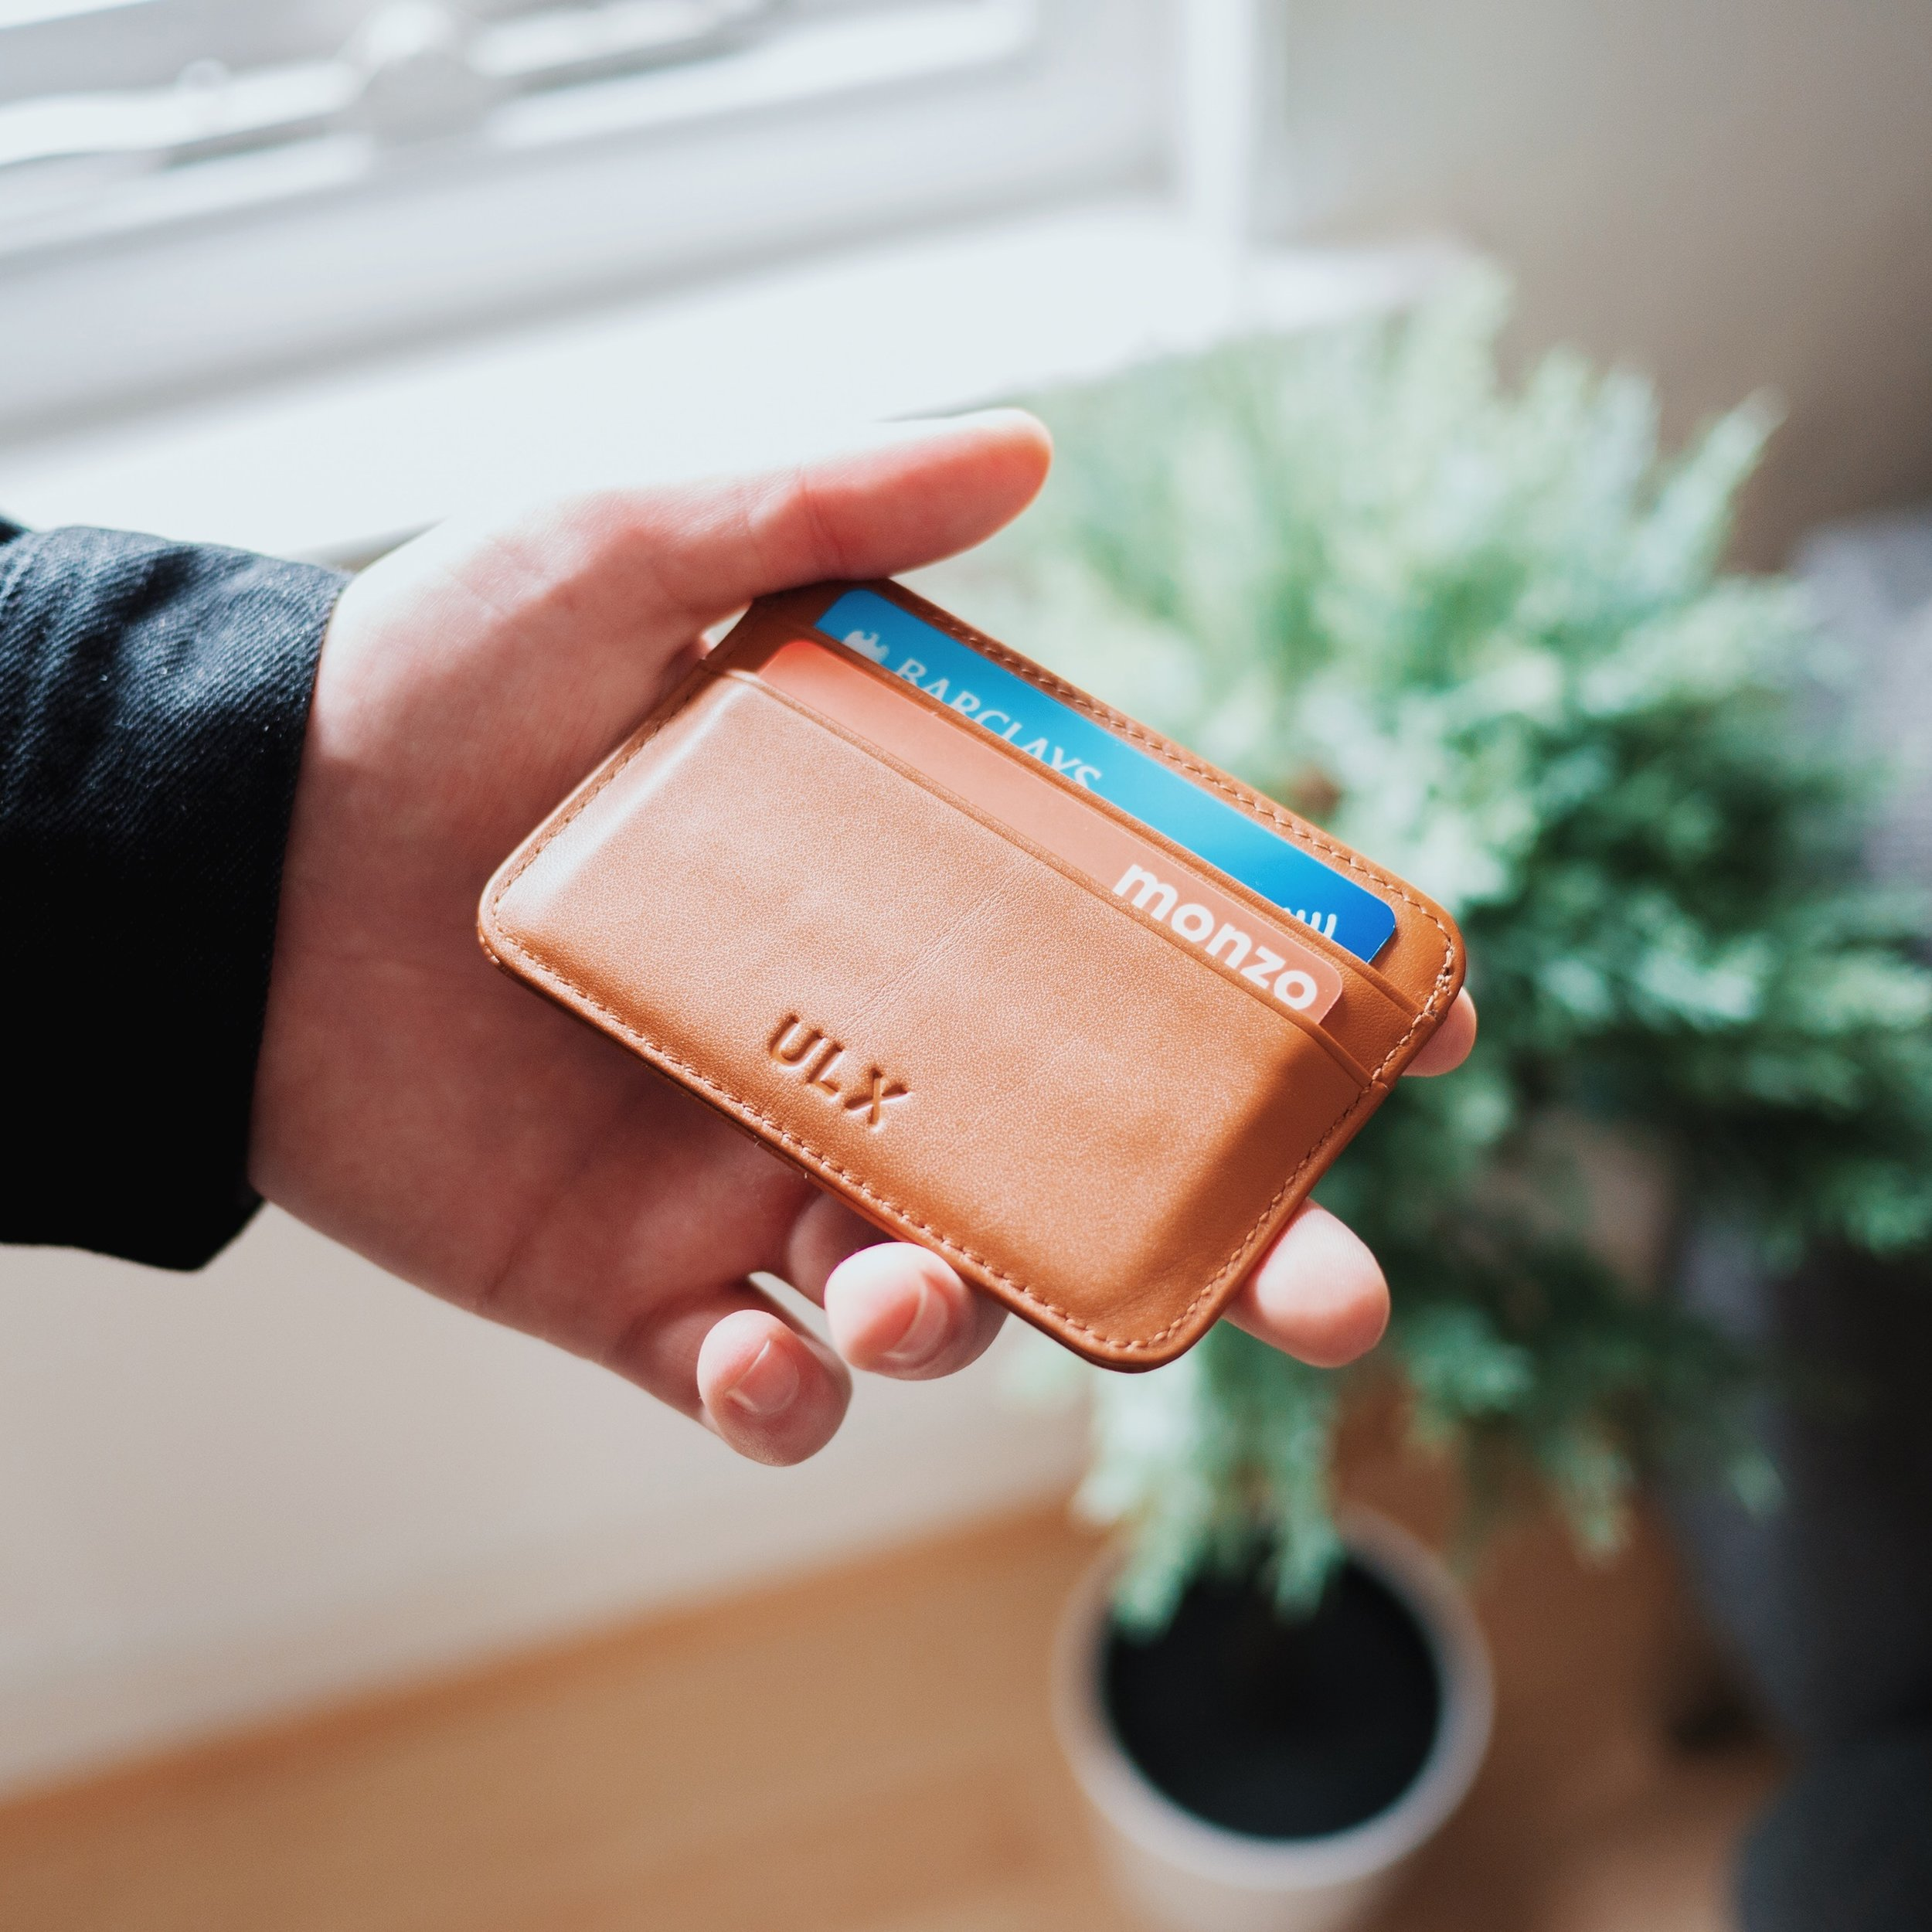 credit cardoliur-745347-unsplash.jpg